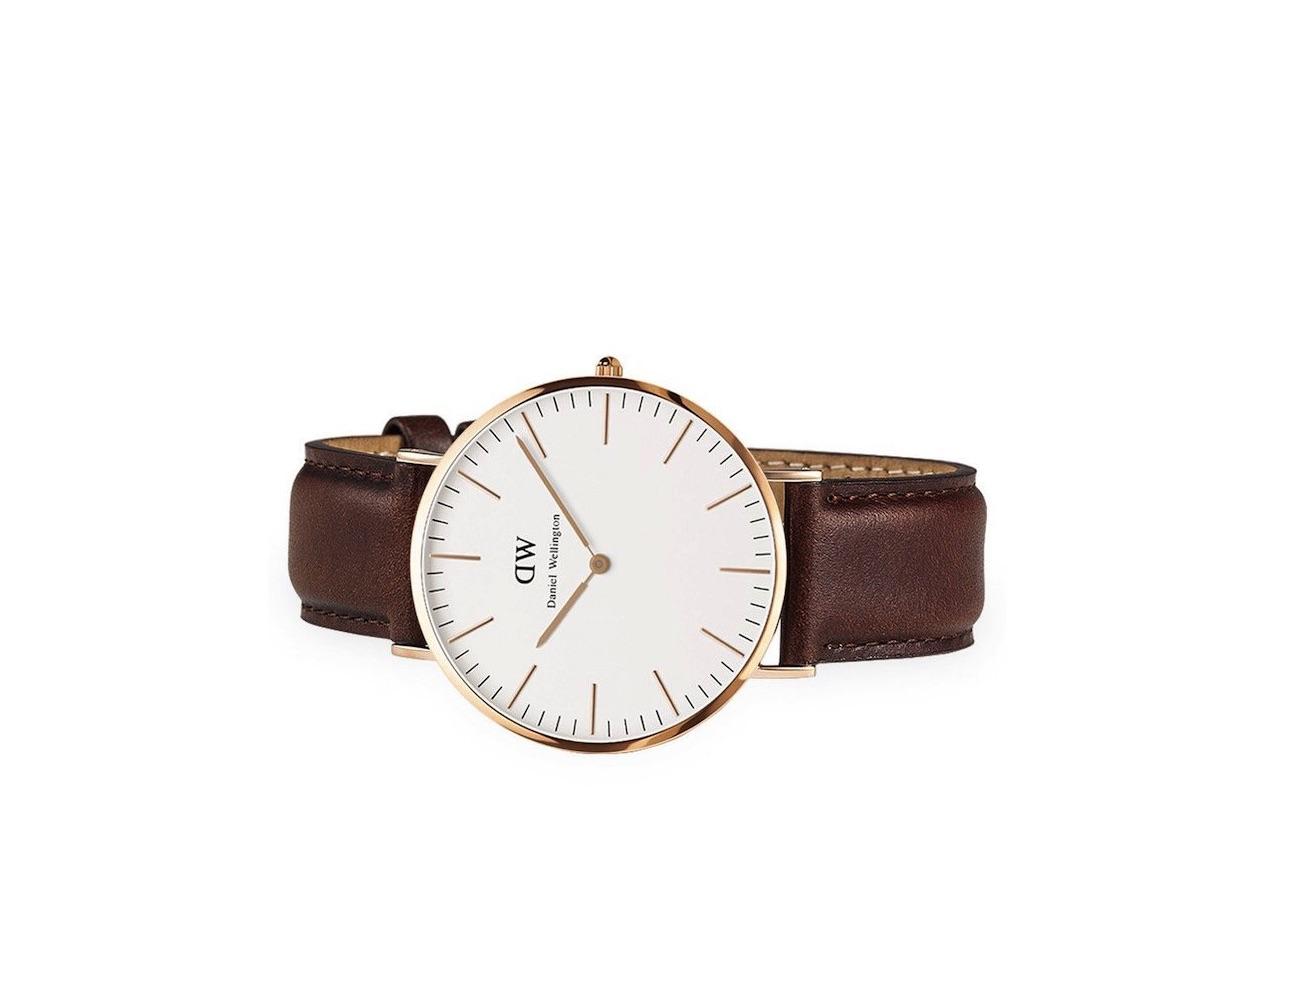 daniel-wellington-bristol-analog-quartz-watch-04